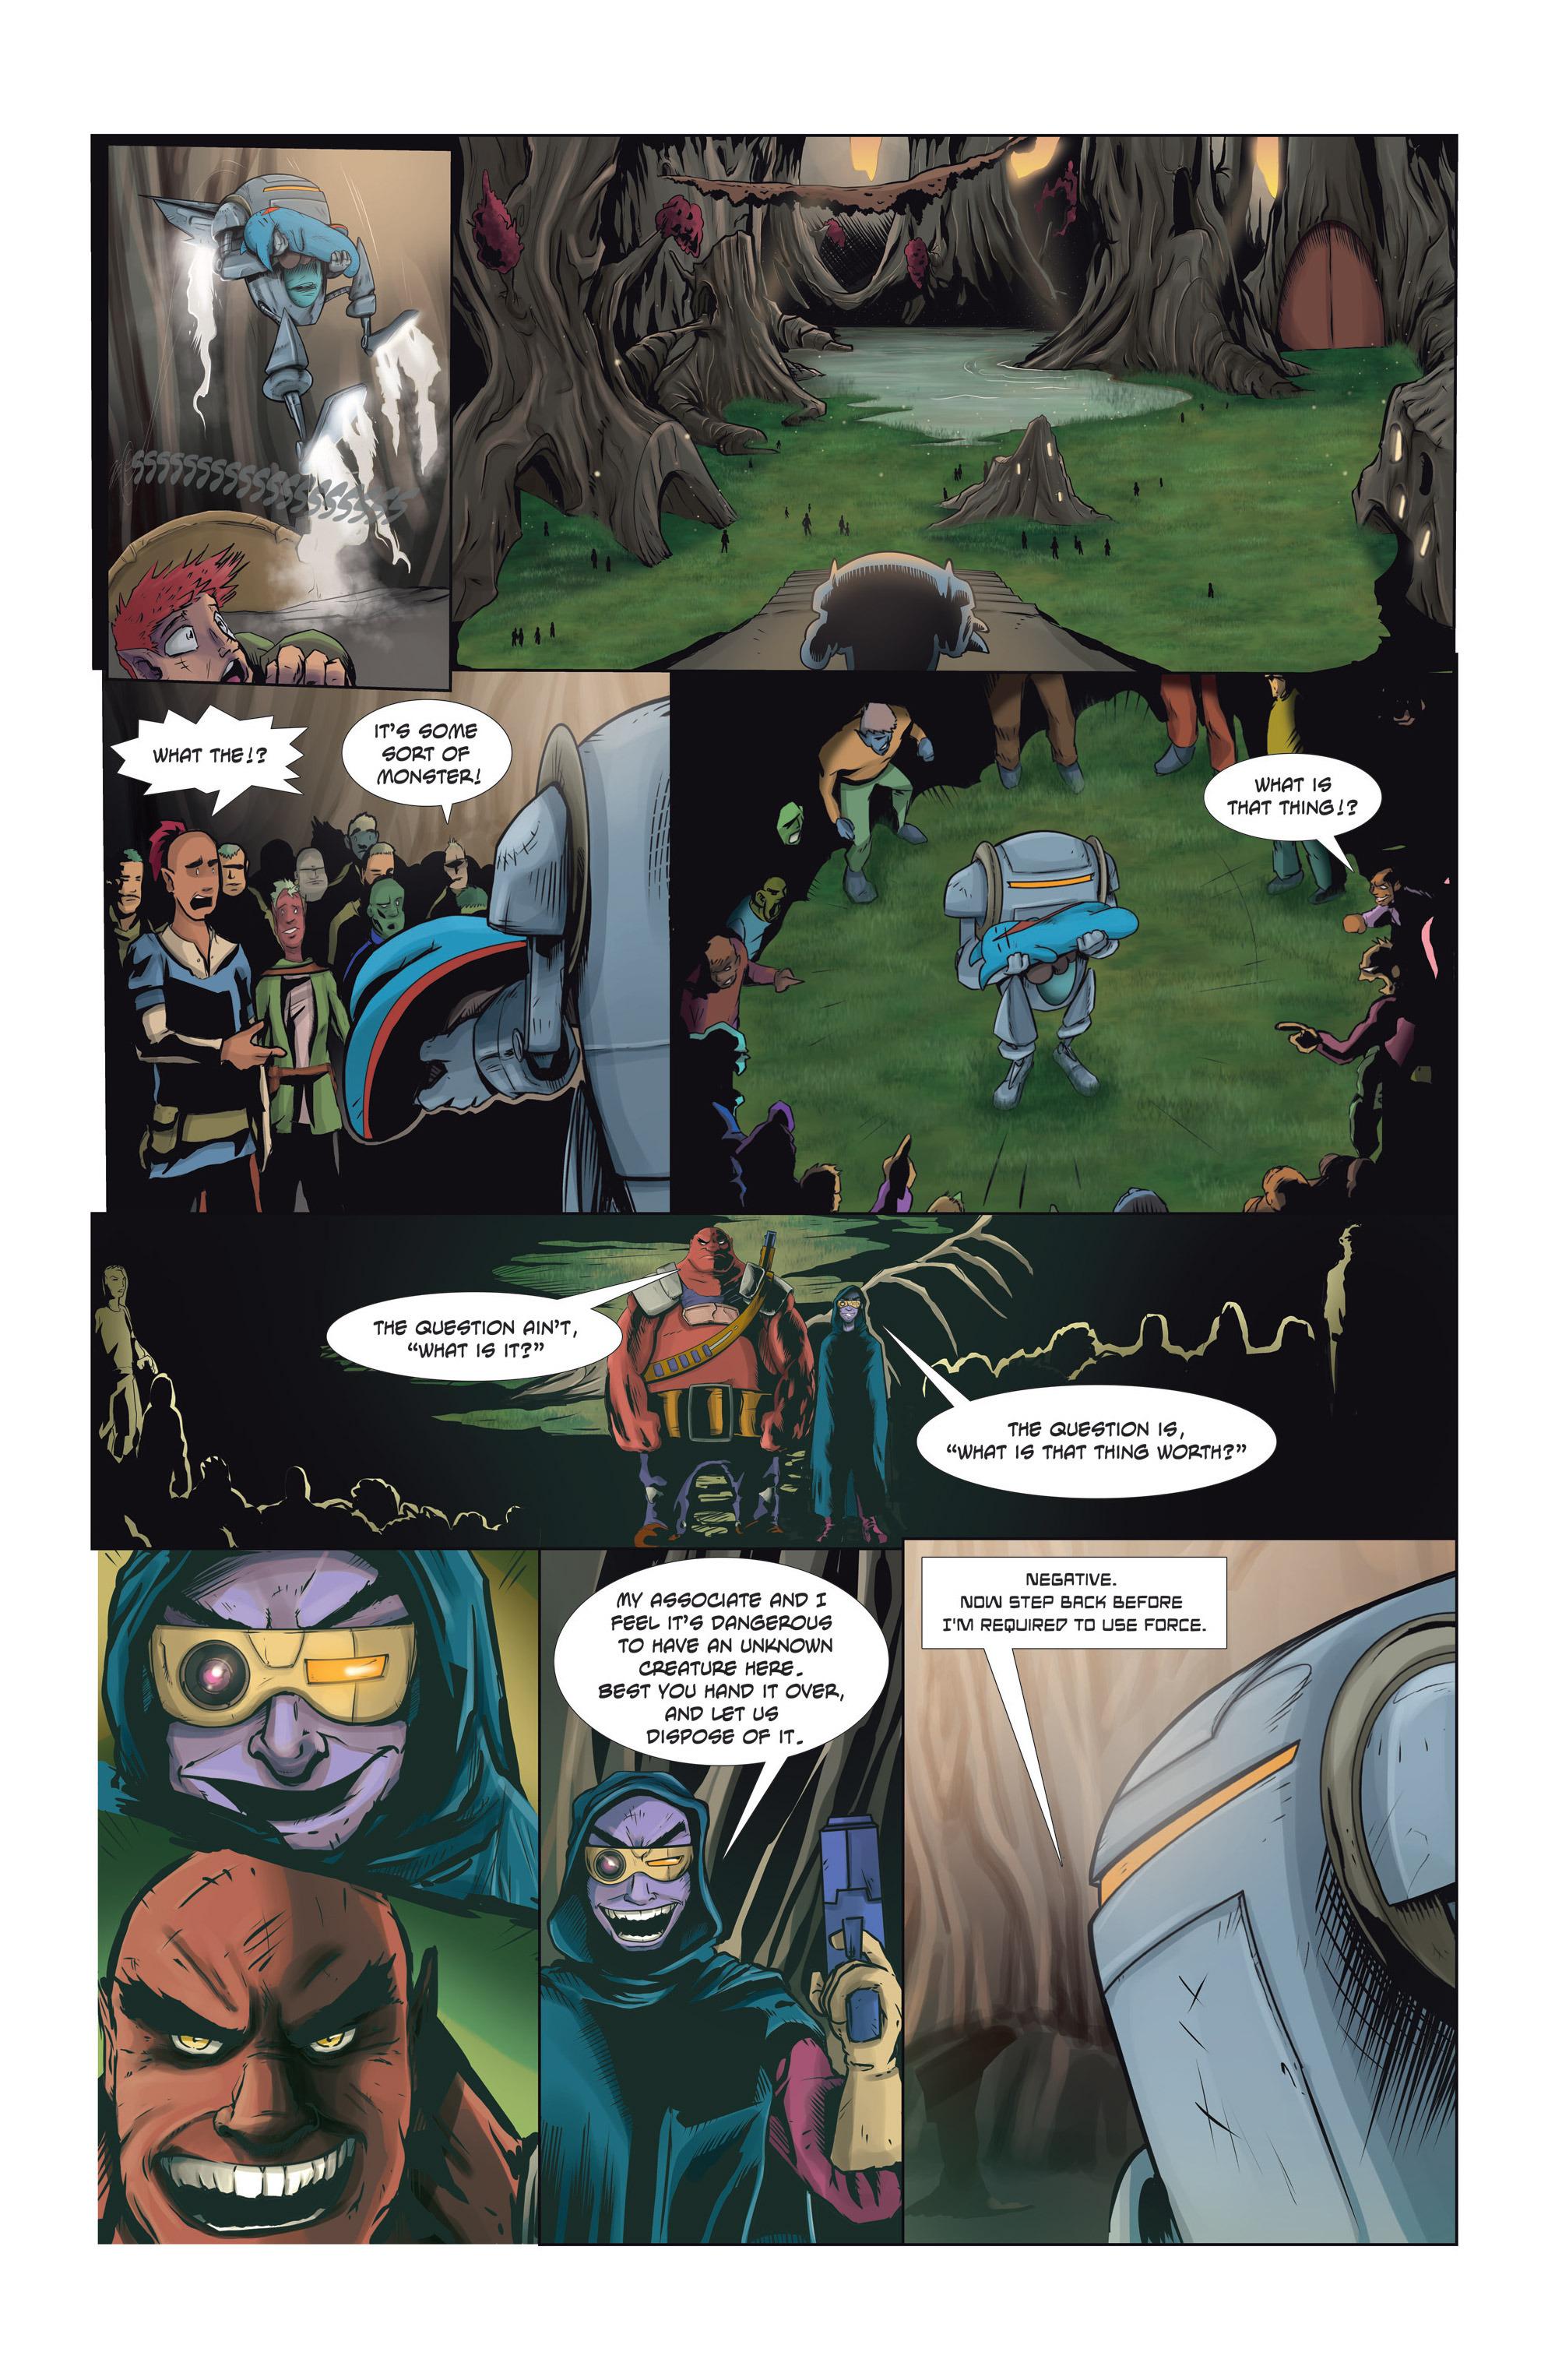 The Adventures of Miru chap 1 pic 12